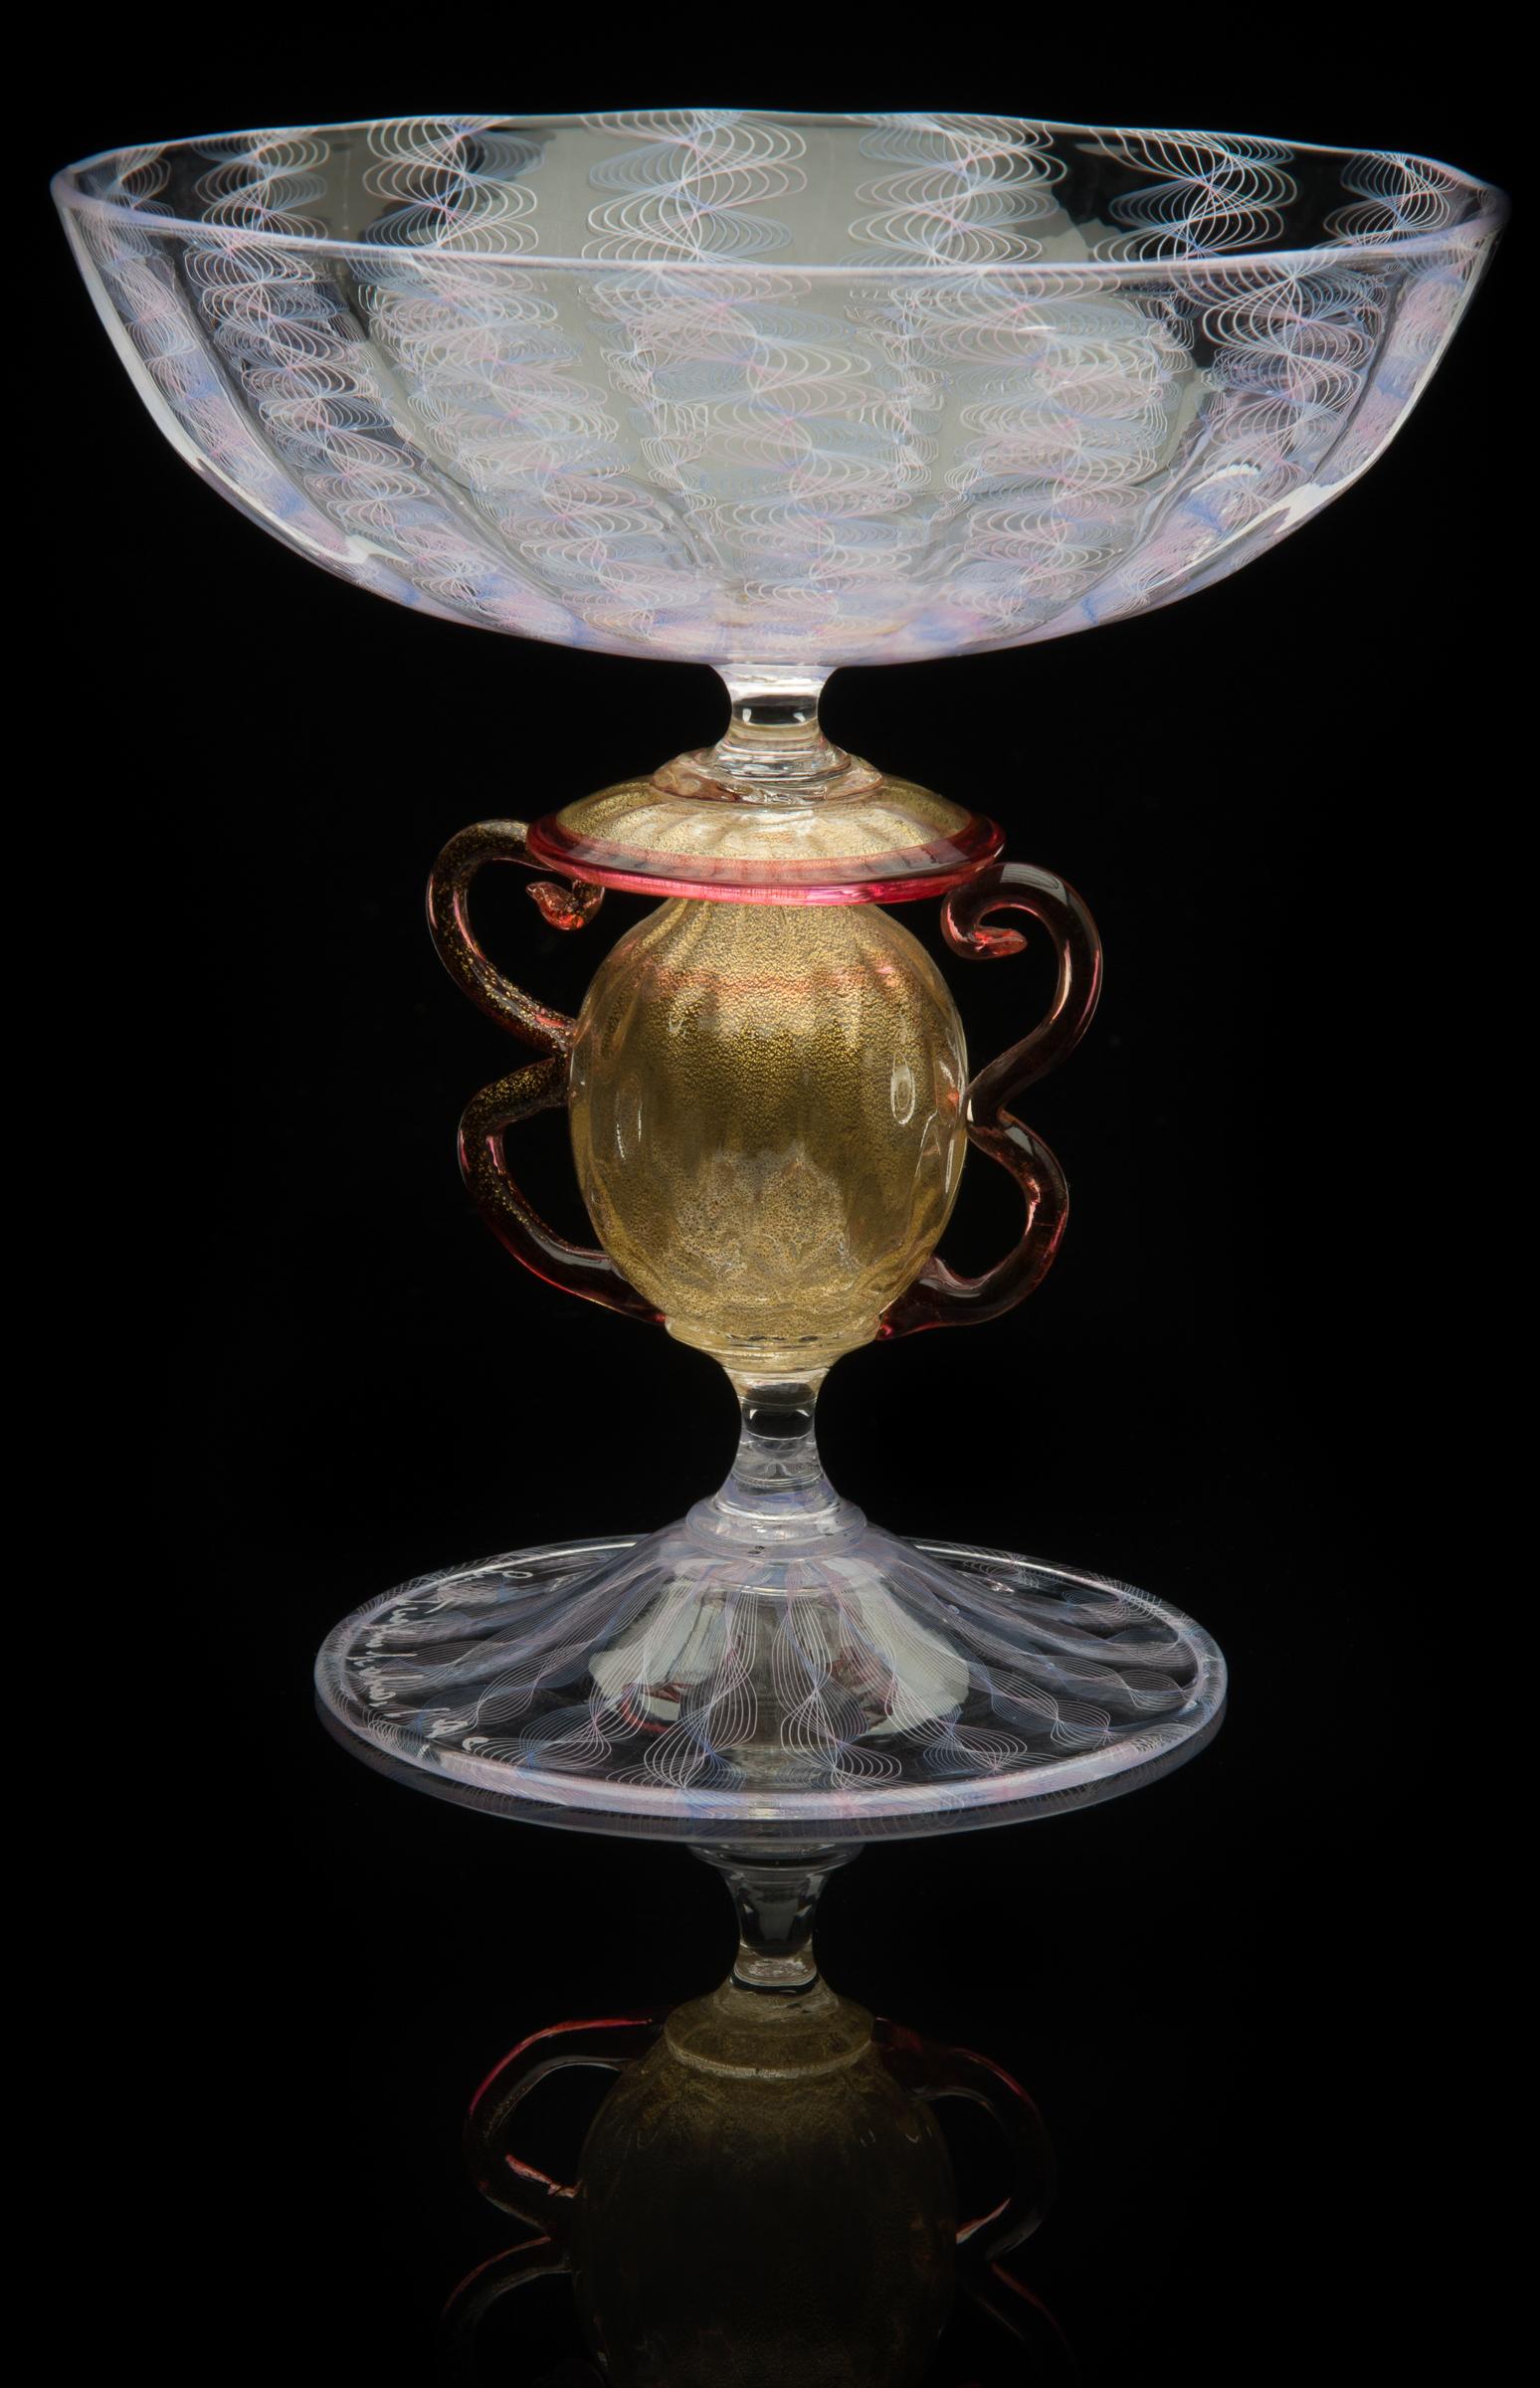 Lino Tagliapietra,  Amphoriskos-stem  Goblet (1991-1994, glass and gold leaf, 5 3/8 x 5 1/4 x 5 1/4inches), LT.27